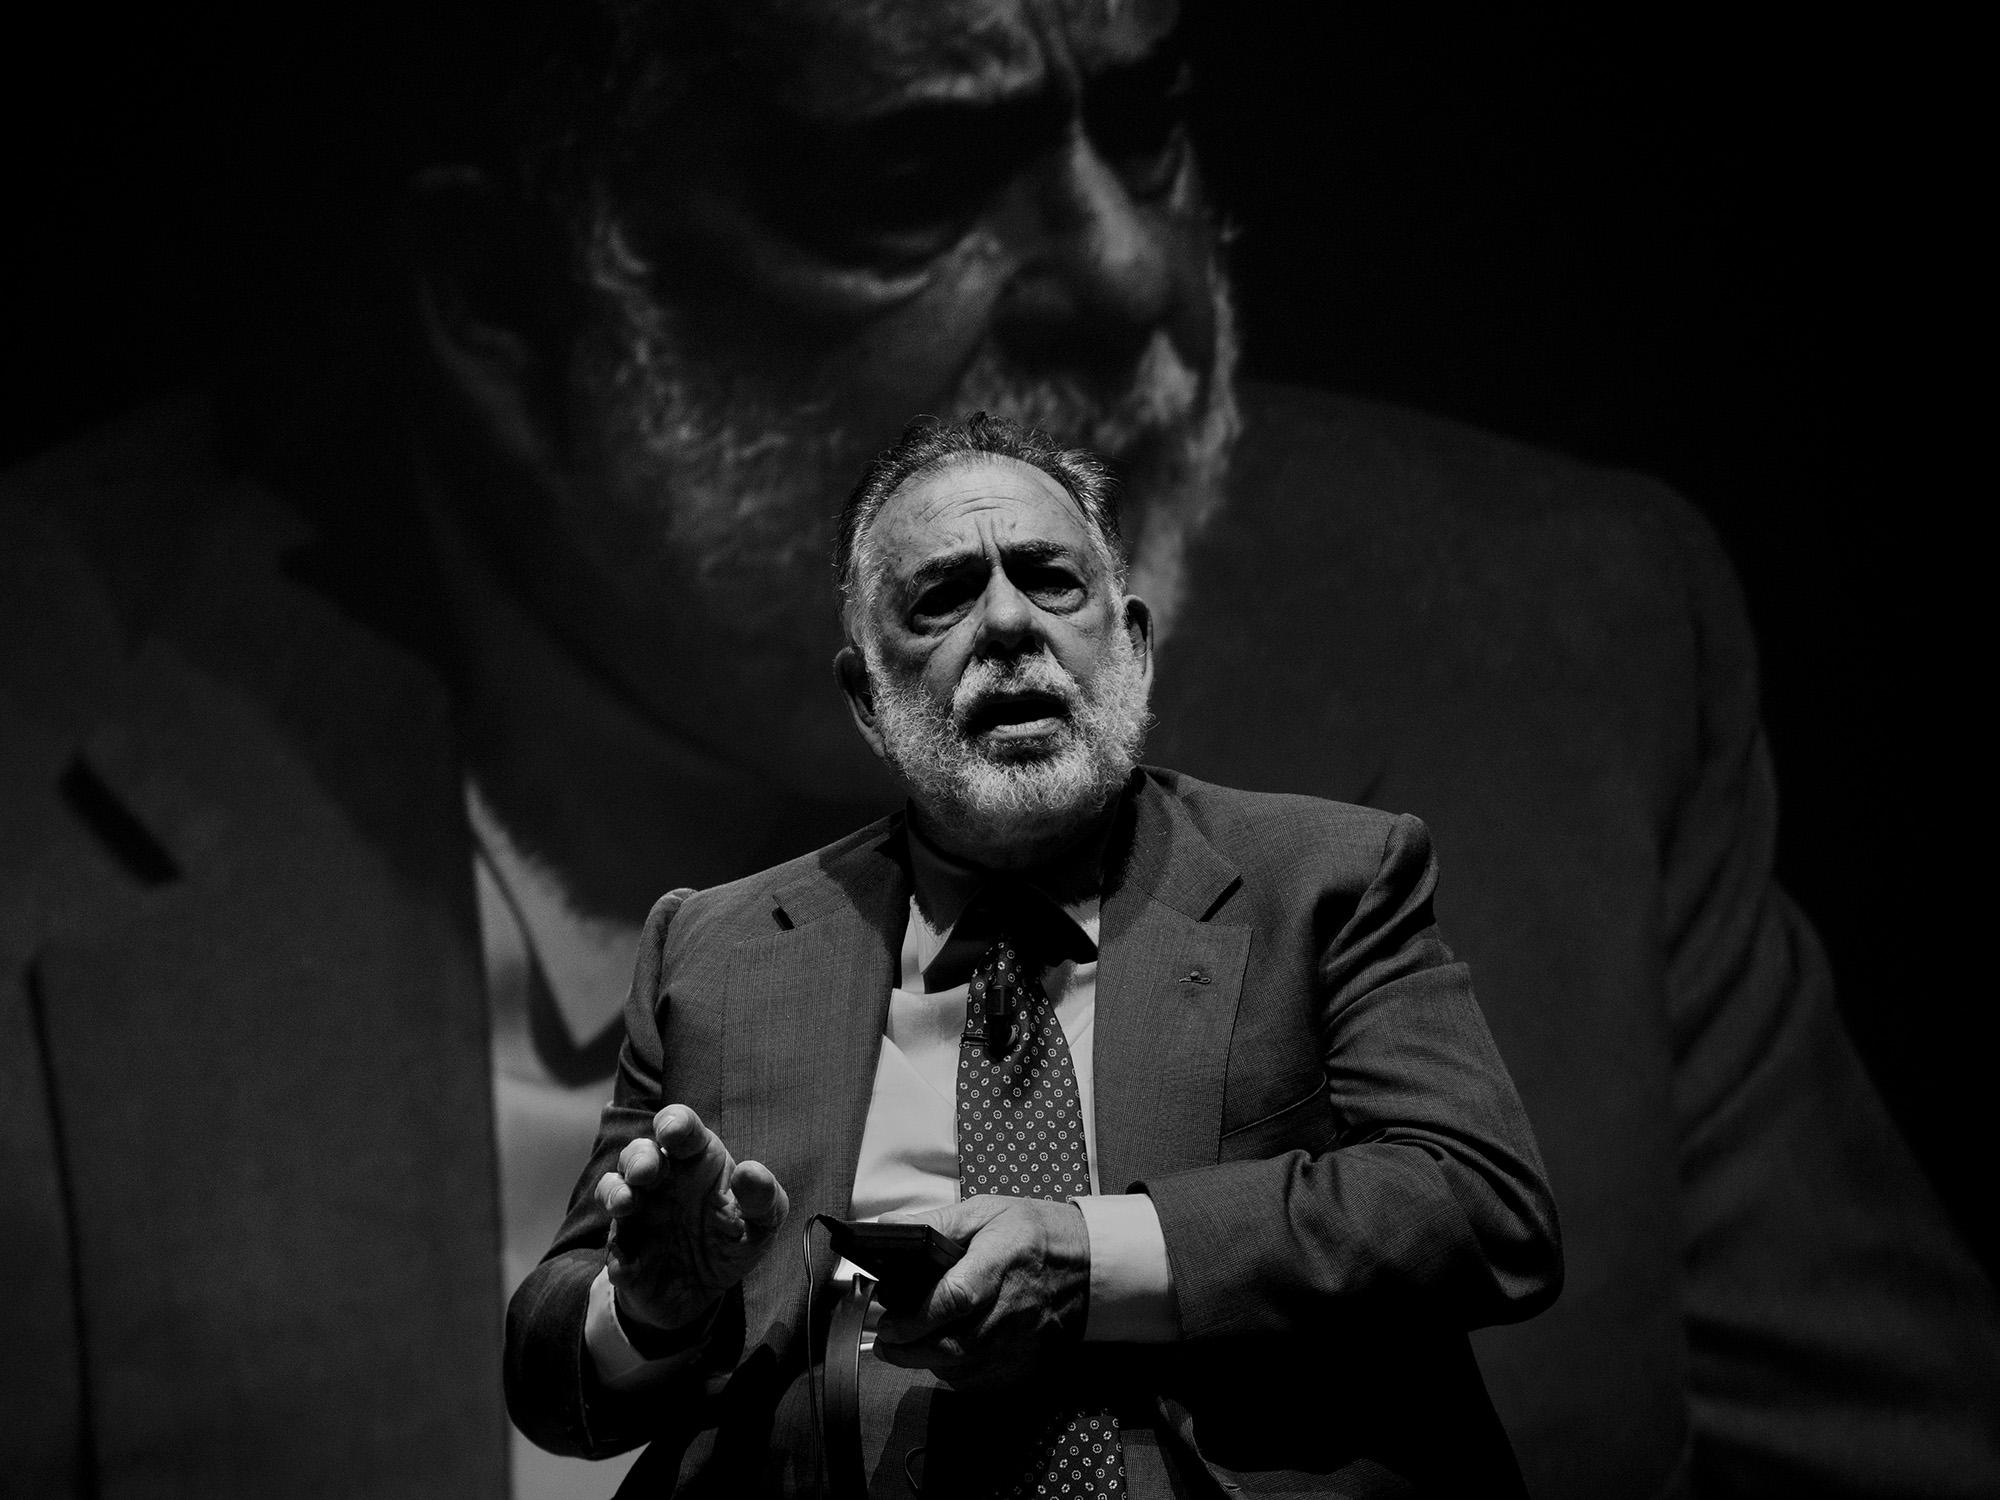 Marco Valli / CESURA